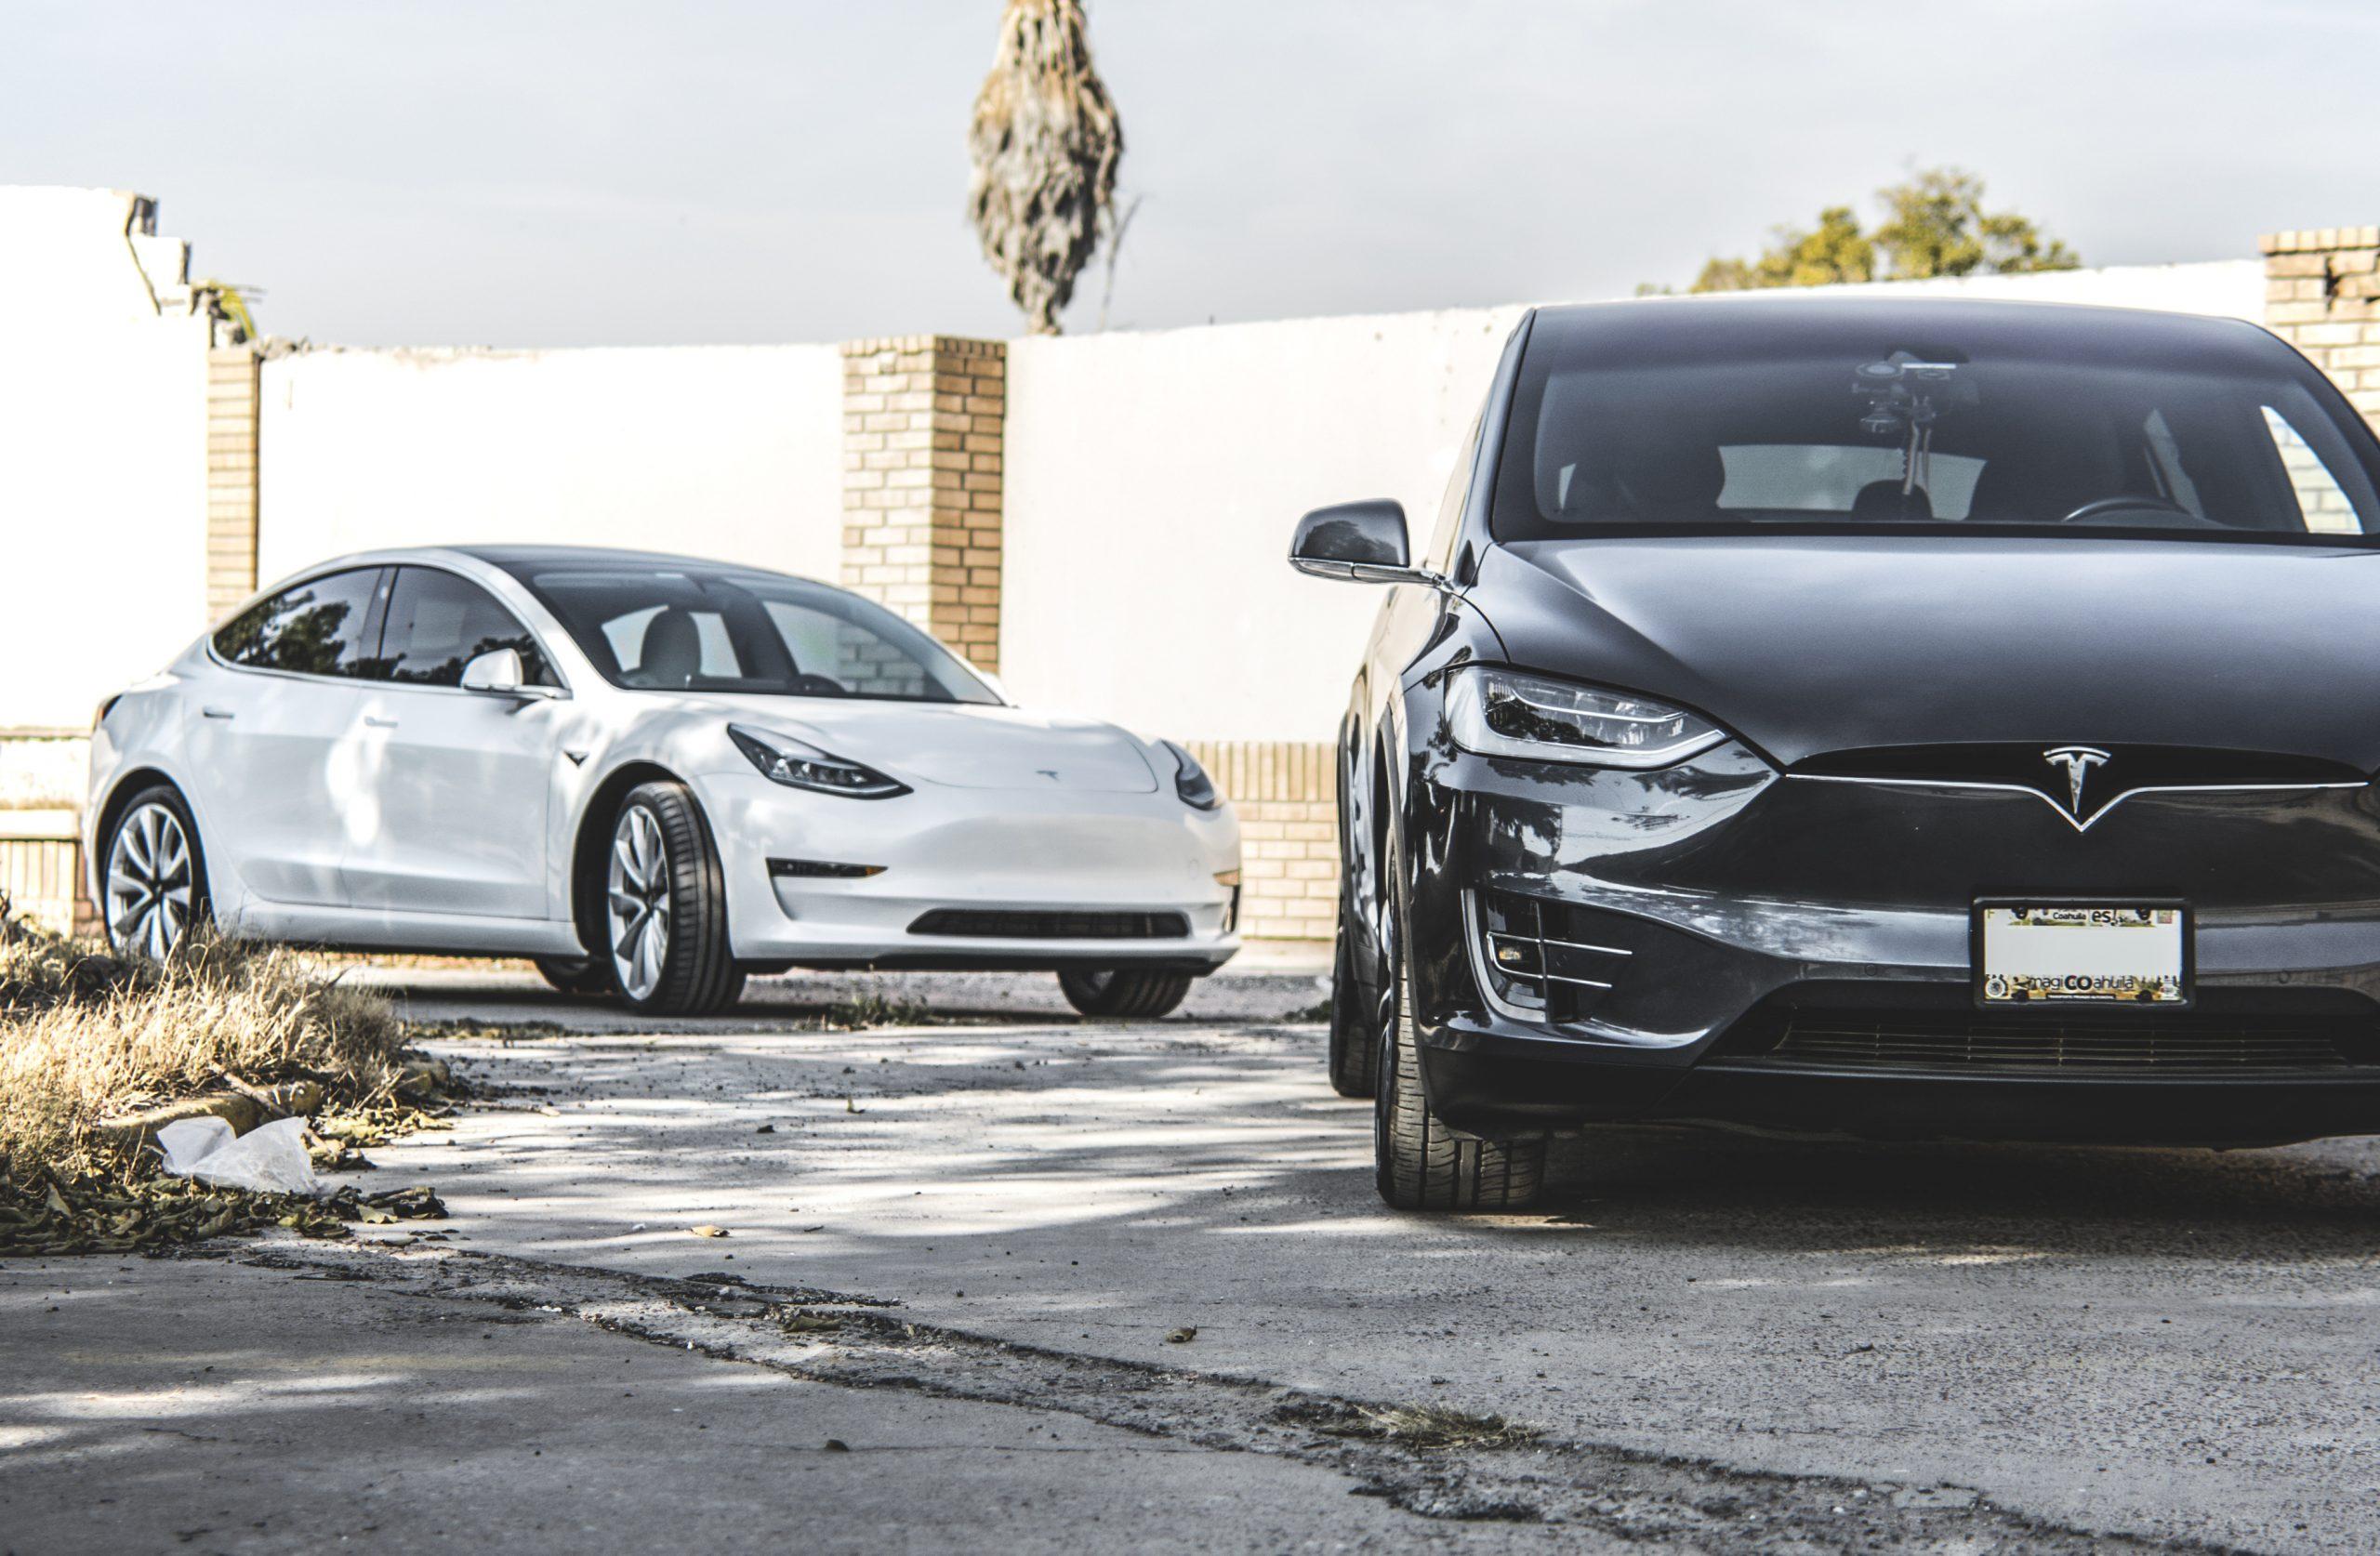 Tesla dominated Q2 U.S. Automotive Exports, data says